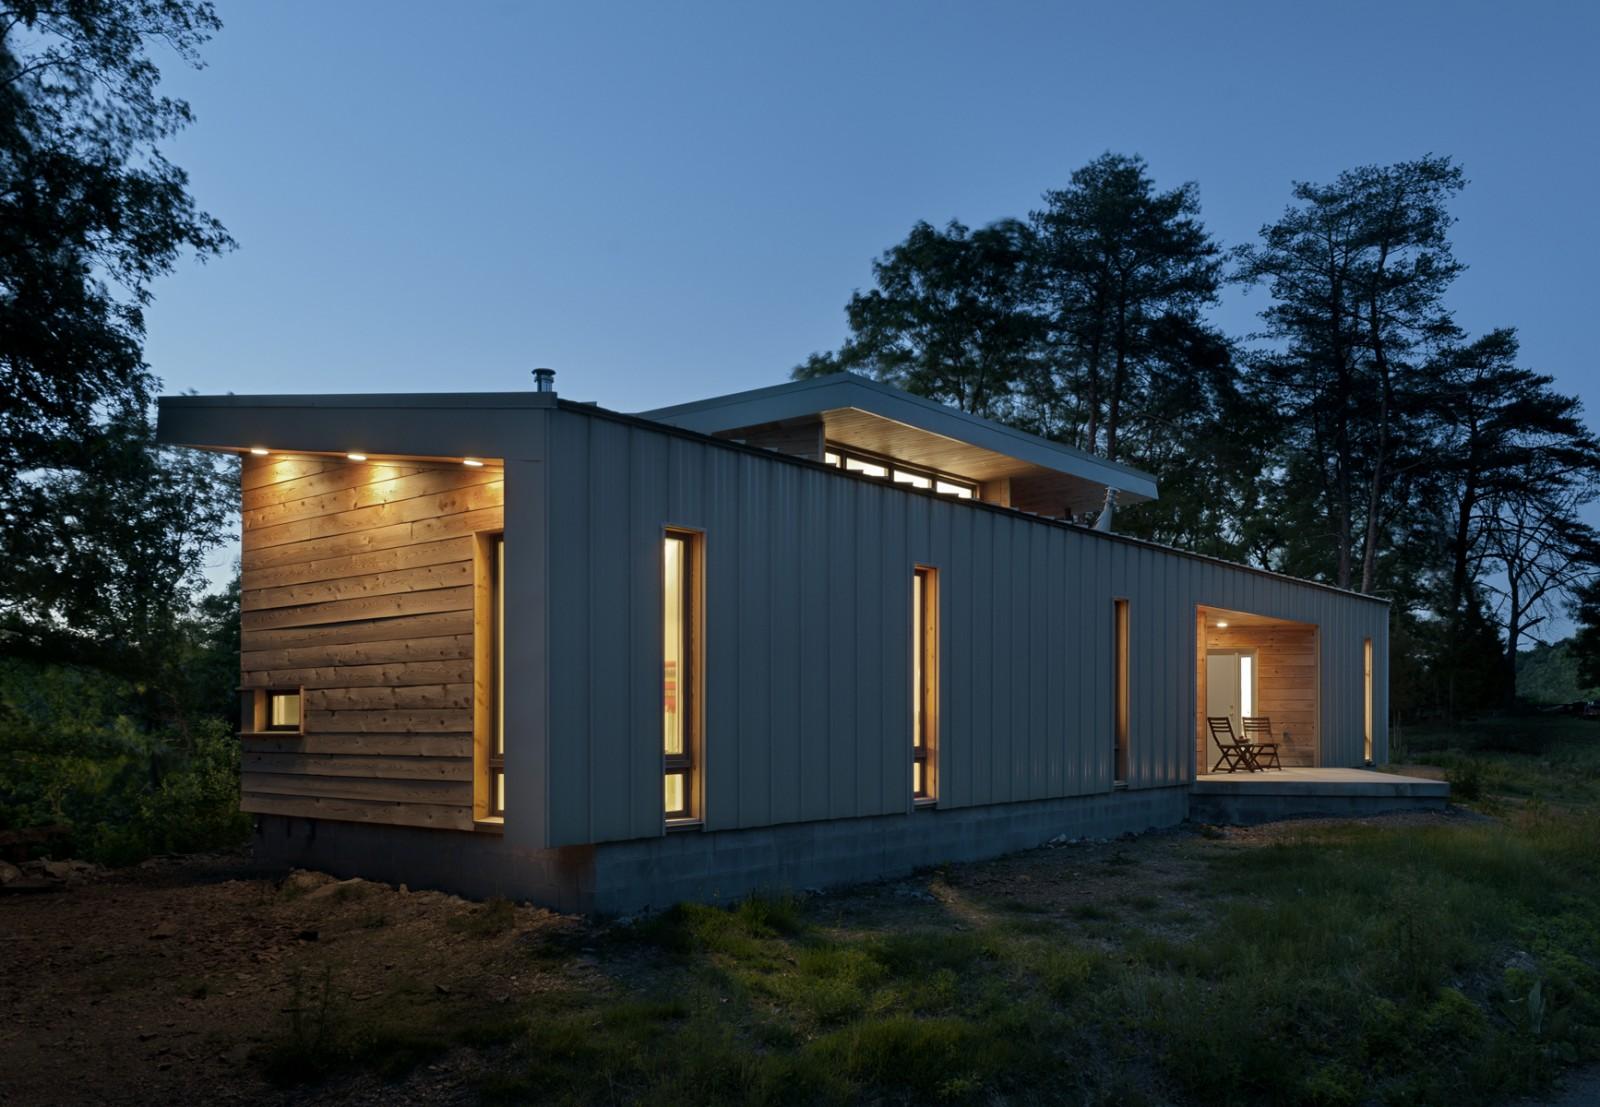 Desain Rumah Kayu Minimalis Satu Lantai - Ridge house -